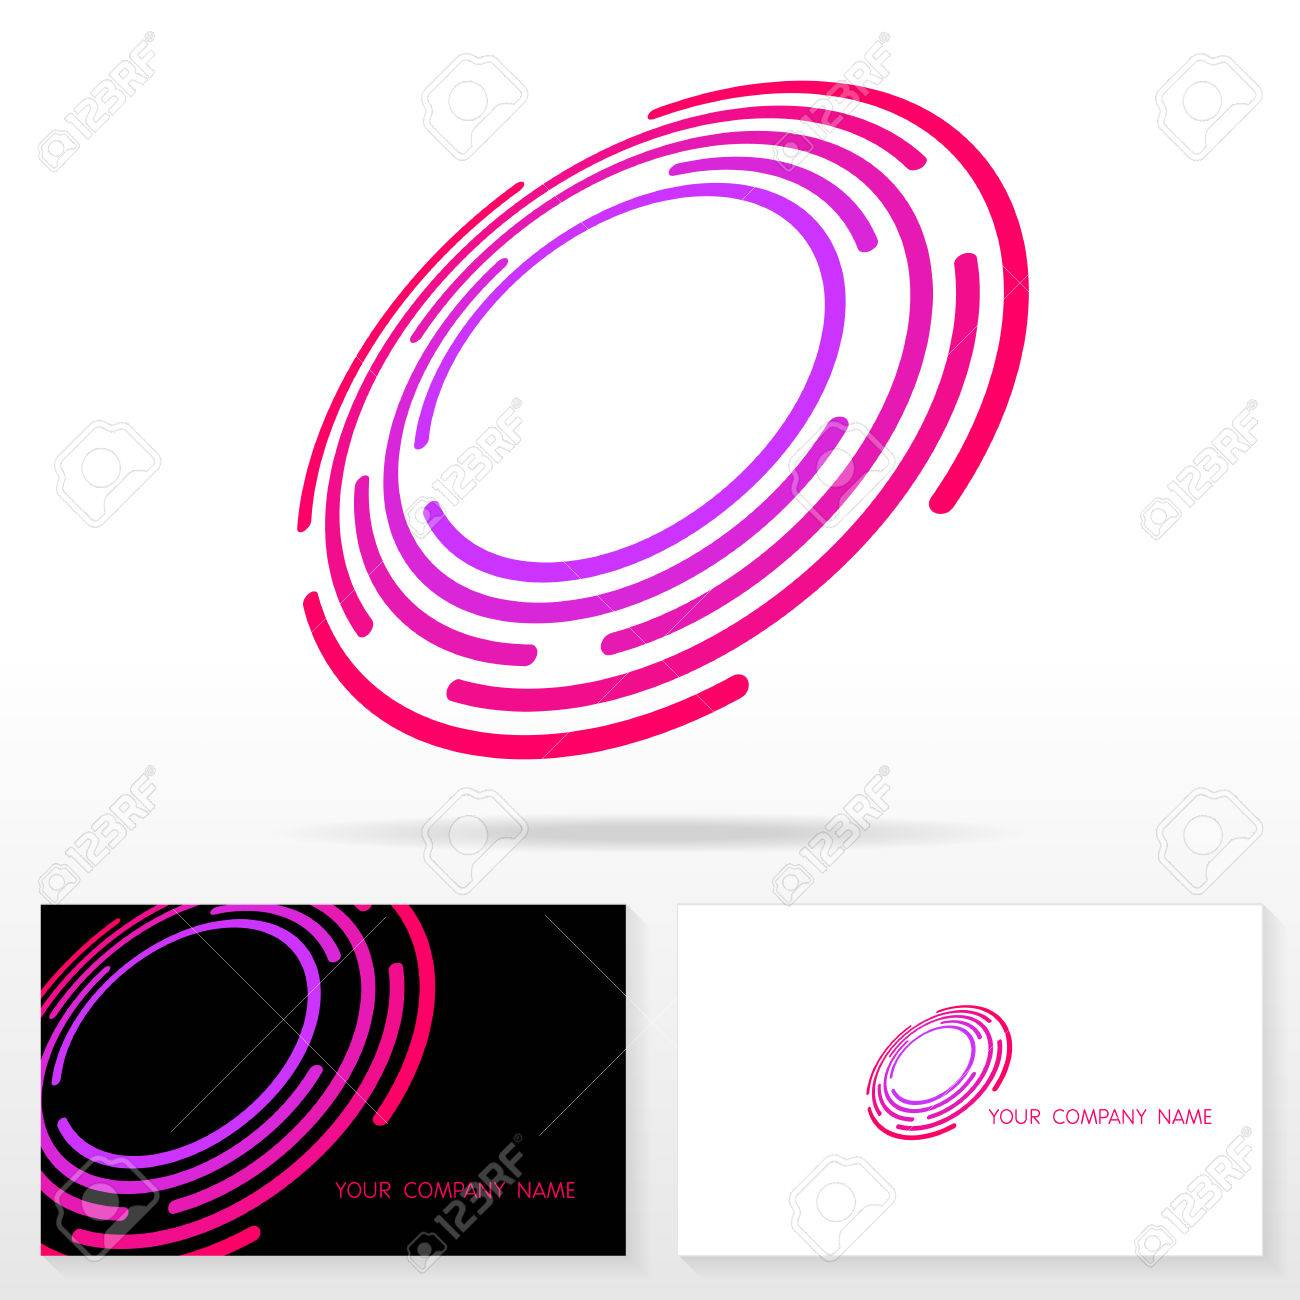 letter o logo icon design template elements illustration letter